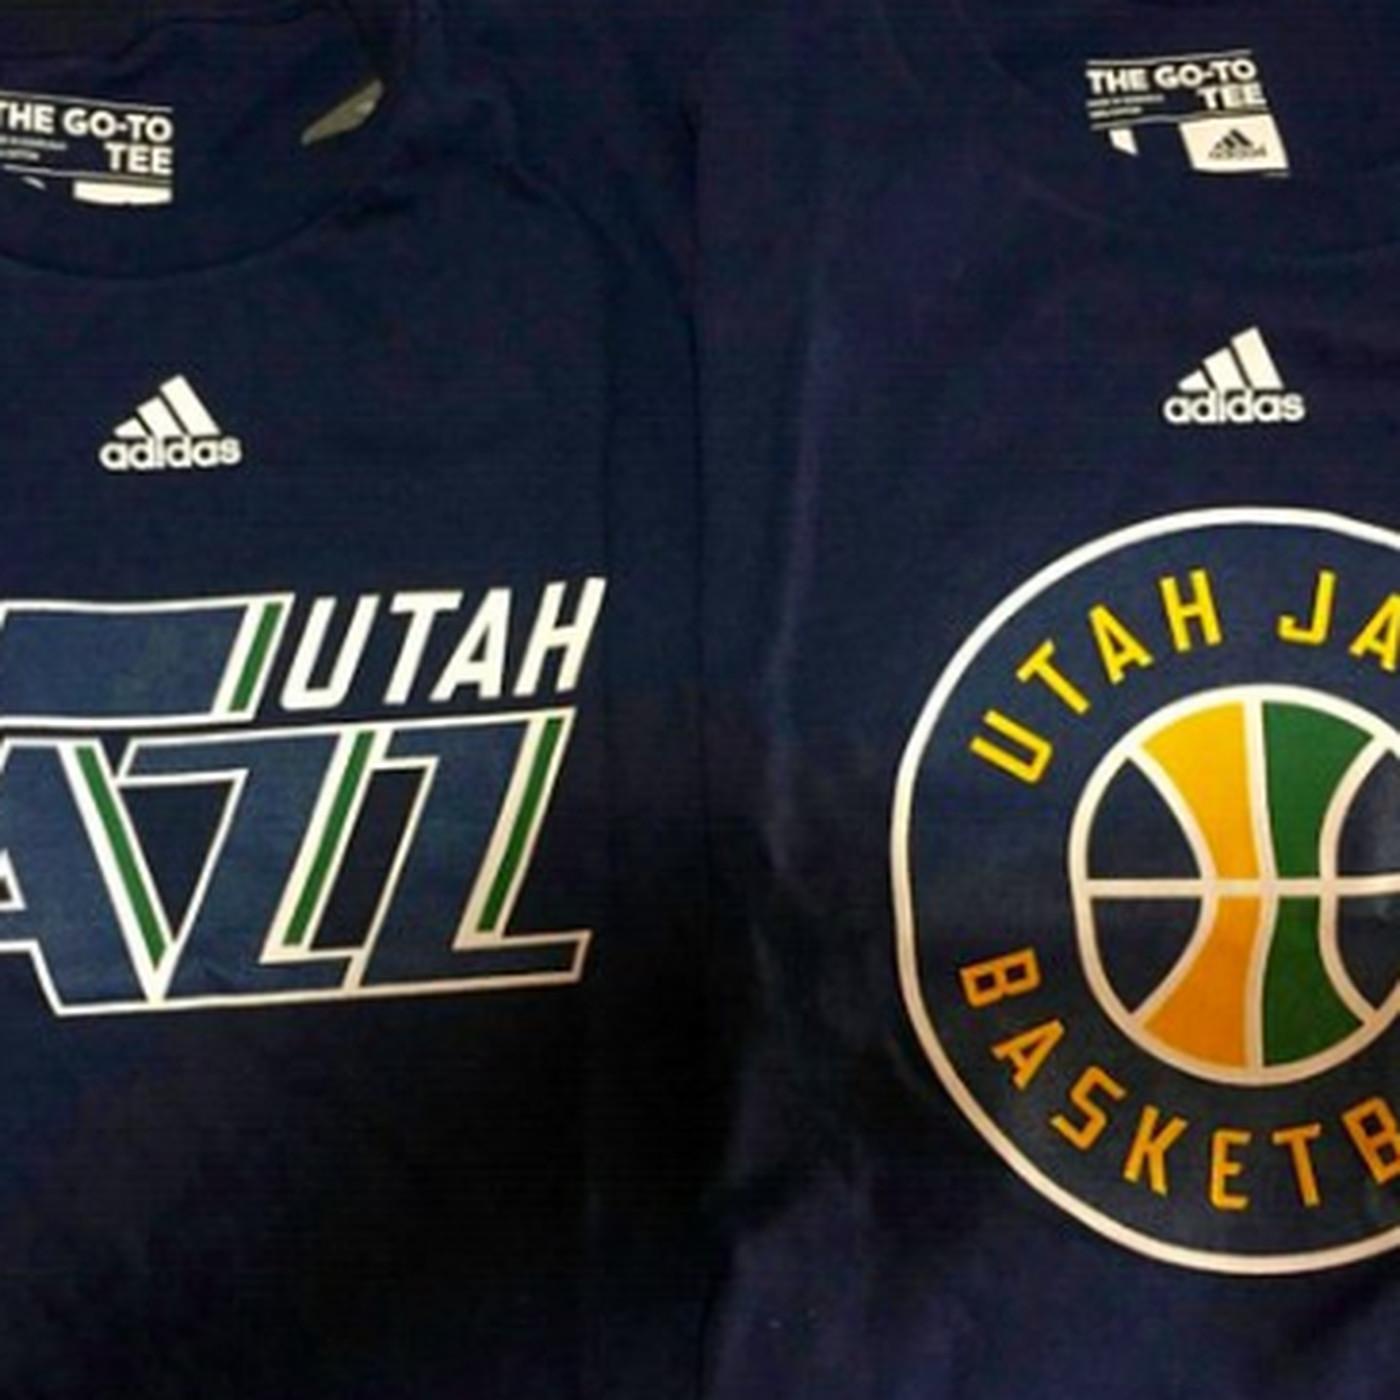 784da6f7e94 Utah Jazz to unveil new logos tomorrow - SLC Dunk